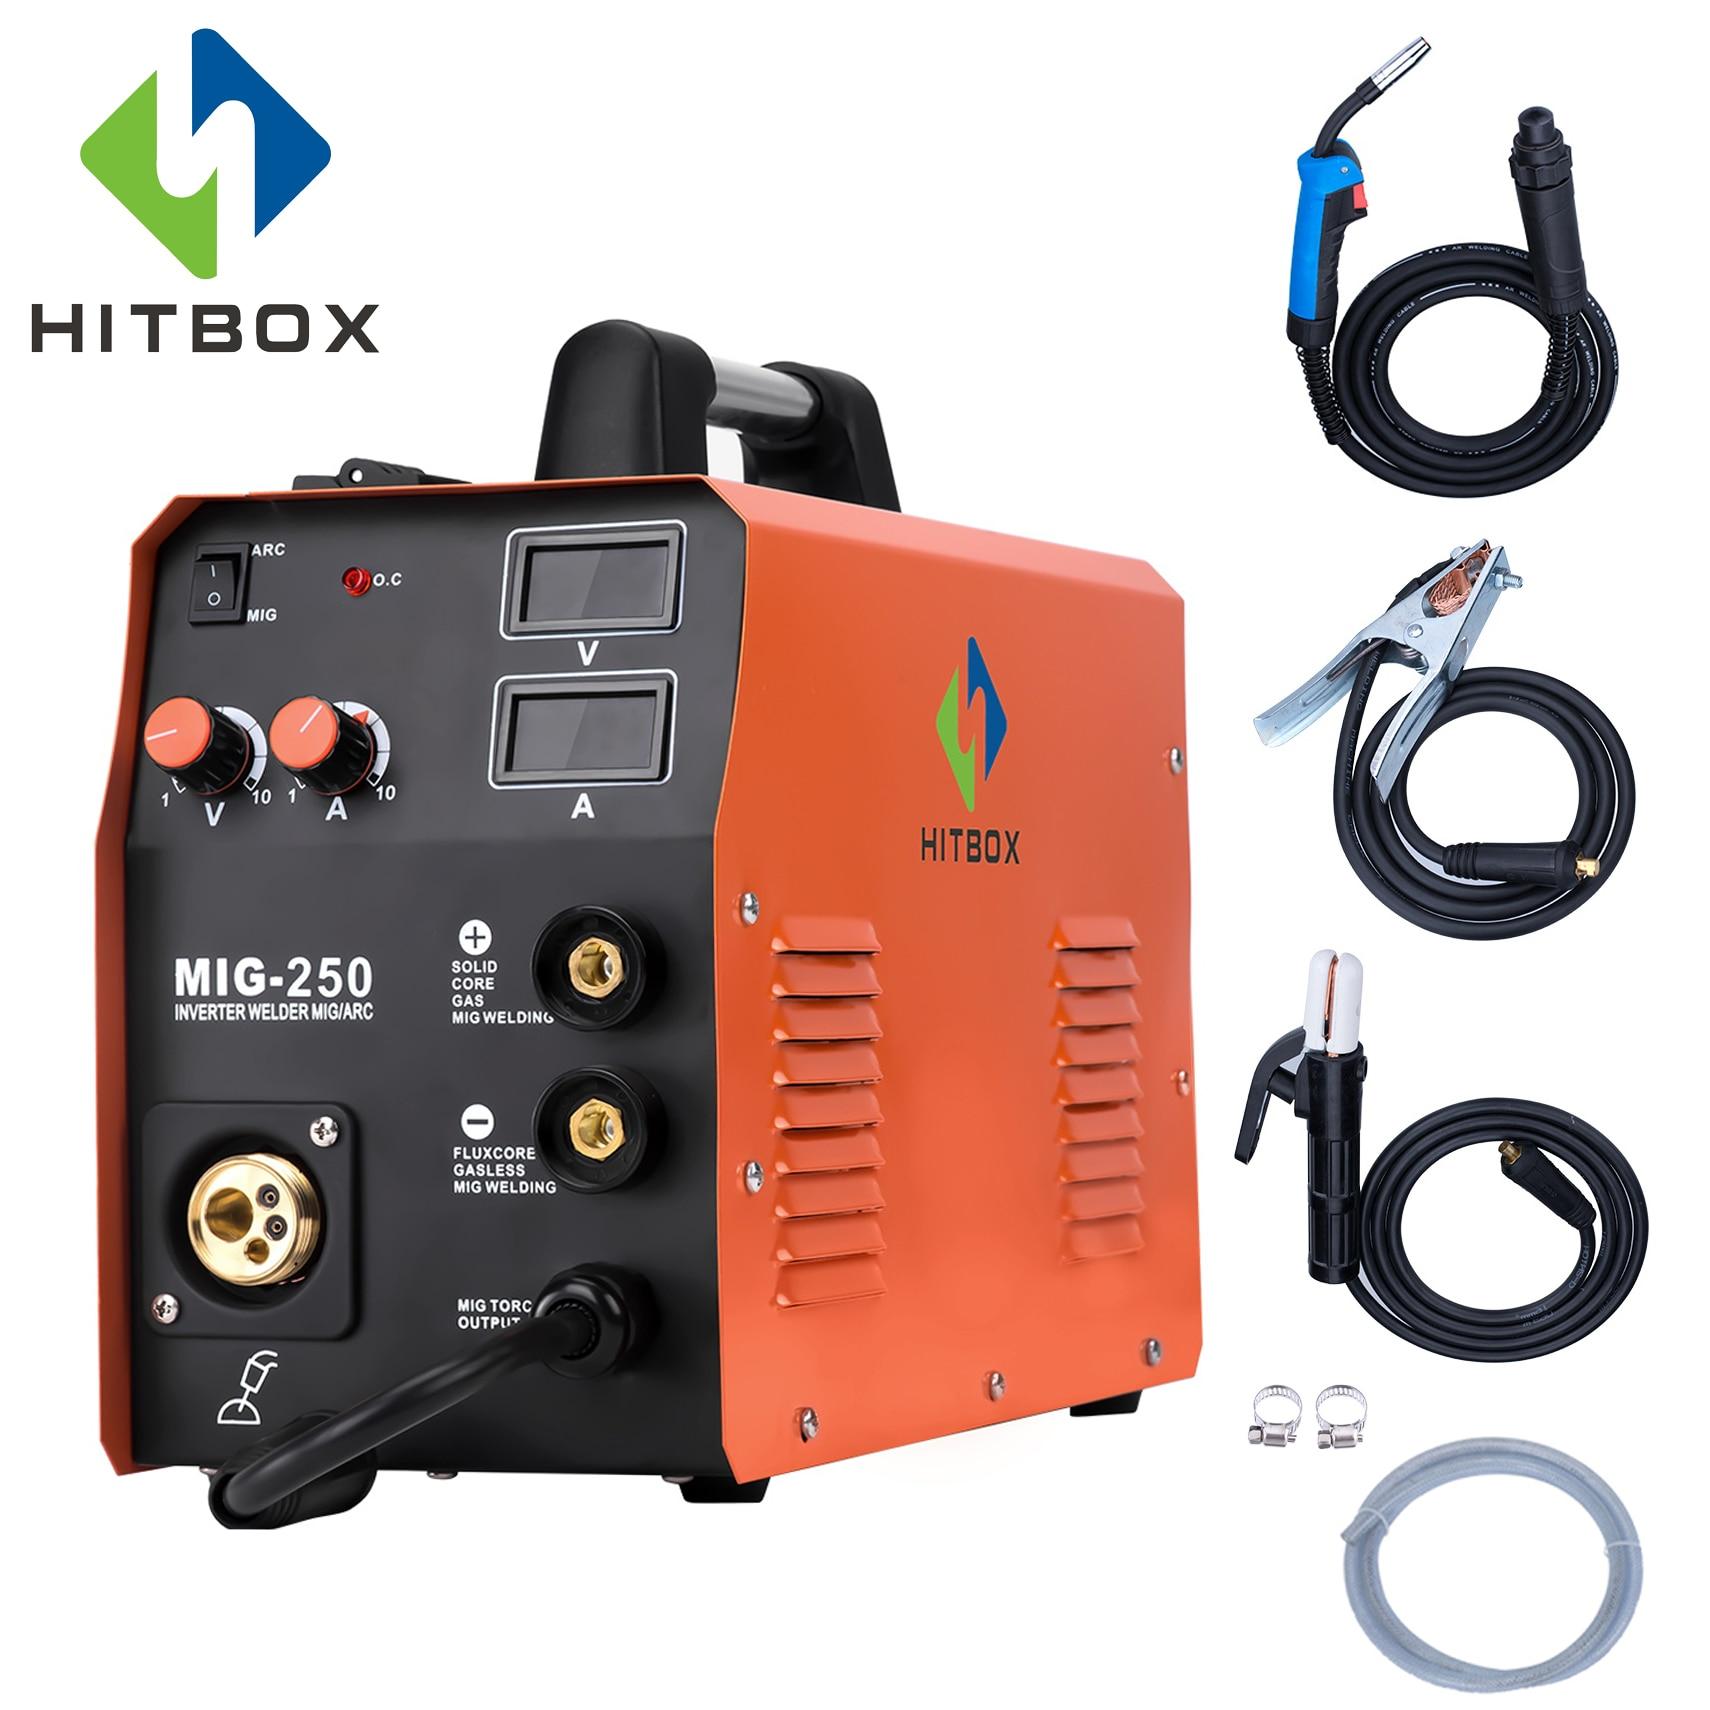 HITBOX Mig Welder MIG TIG ARC MIG250 Multi Function Mig Welding Machine Gas No Gas Welder